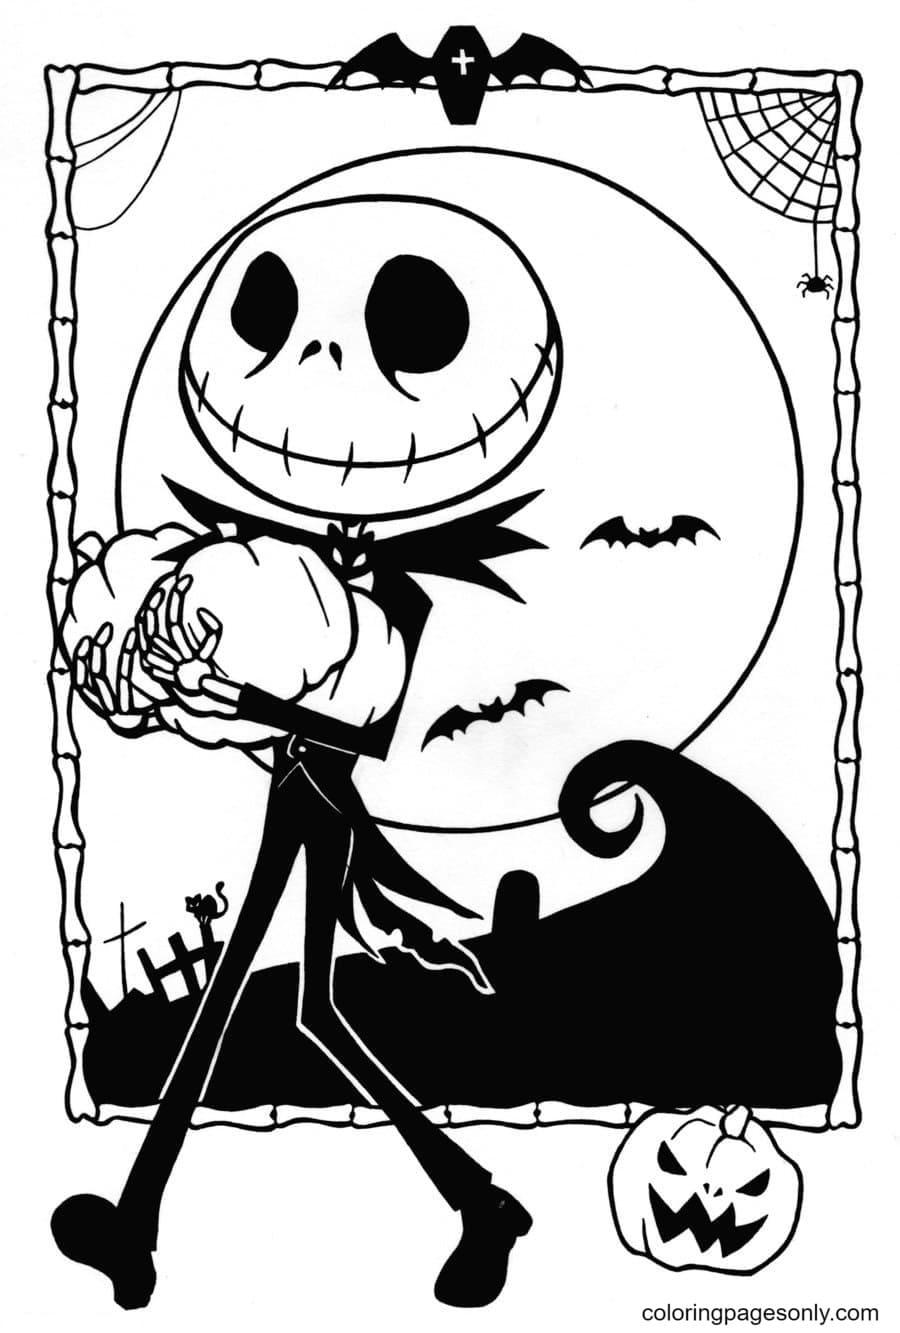 Jack Skellington The Pumpkin King Coloring Page